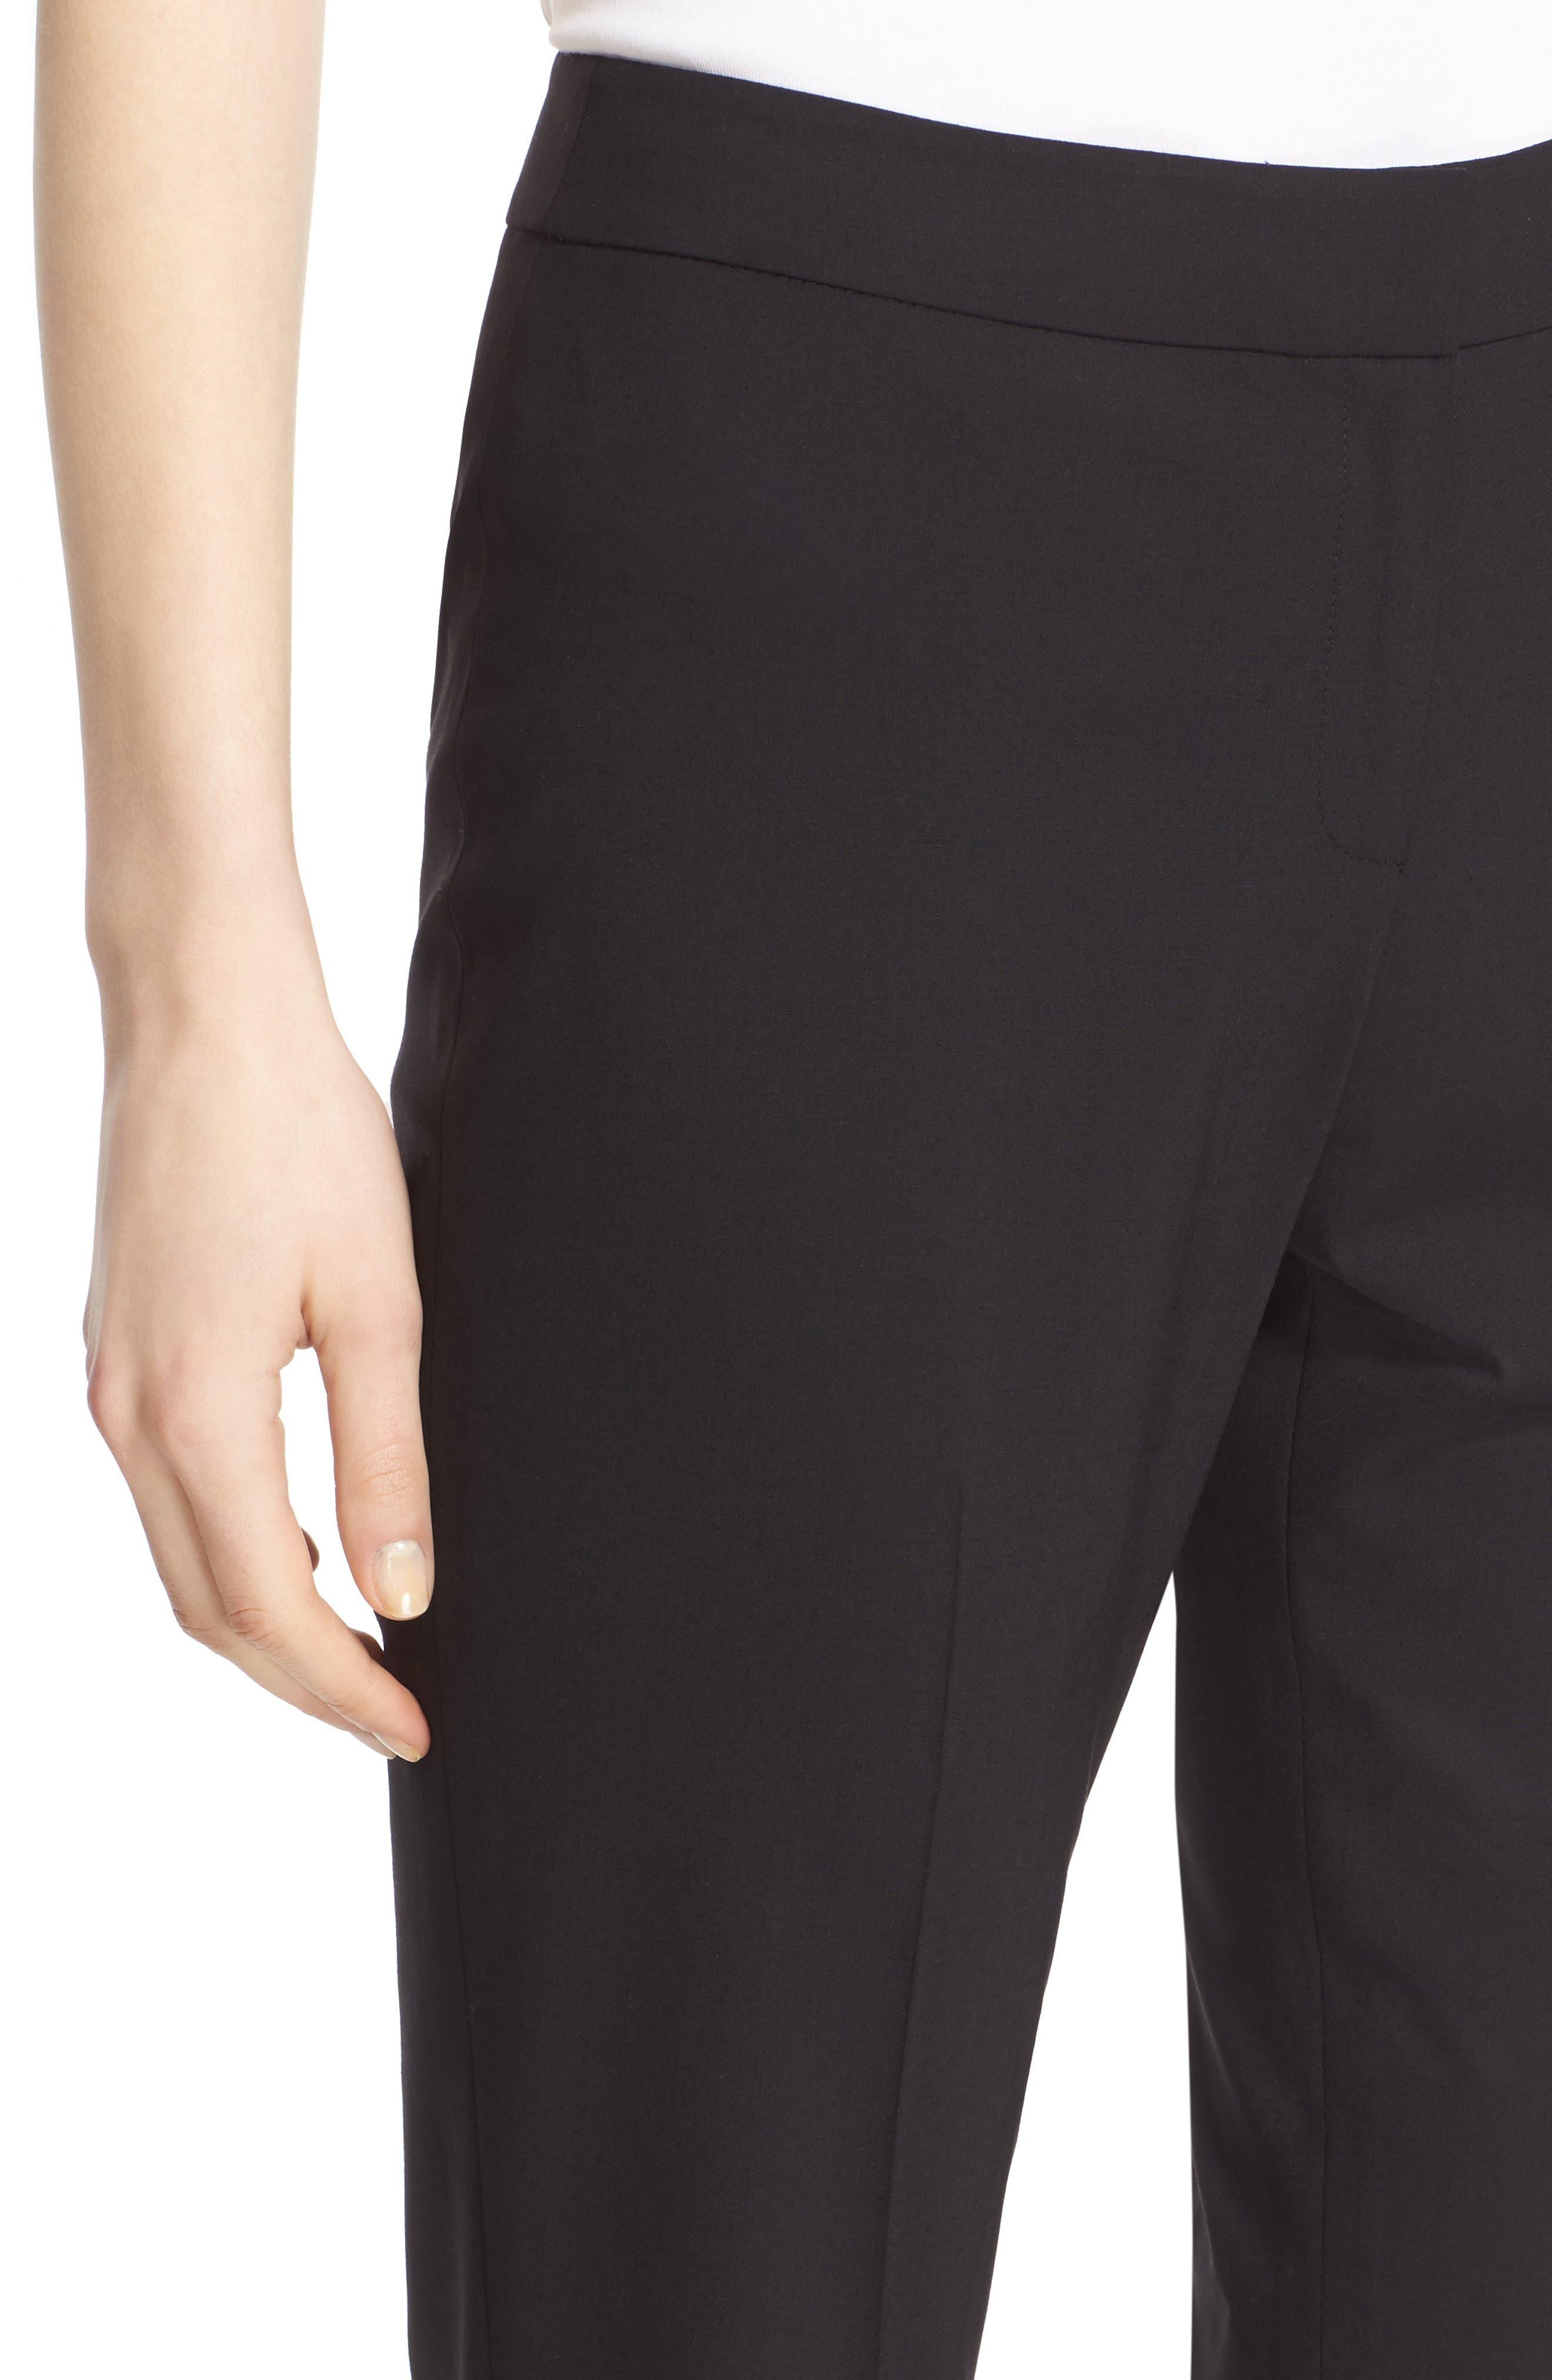 Barrow Stretch Wool Pants,                             Alternate thumbnail 4, color,                             BLACK